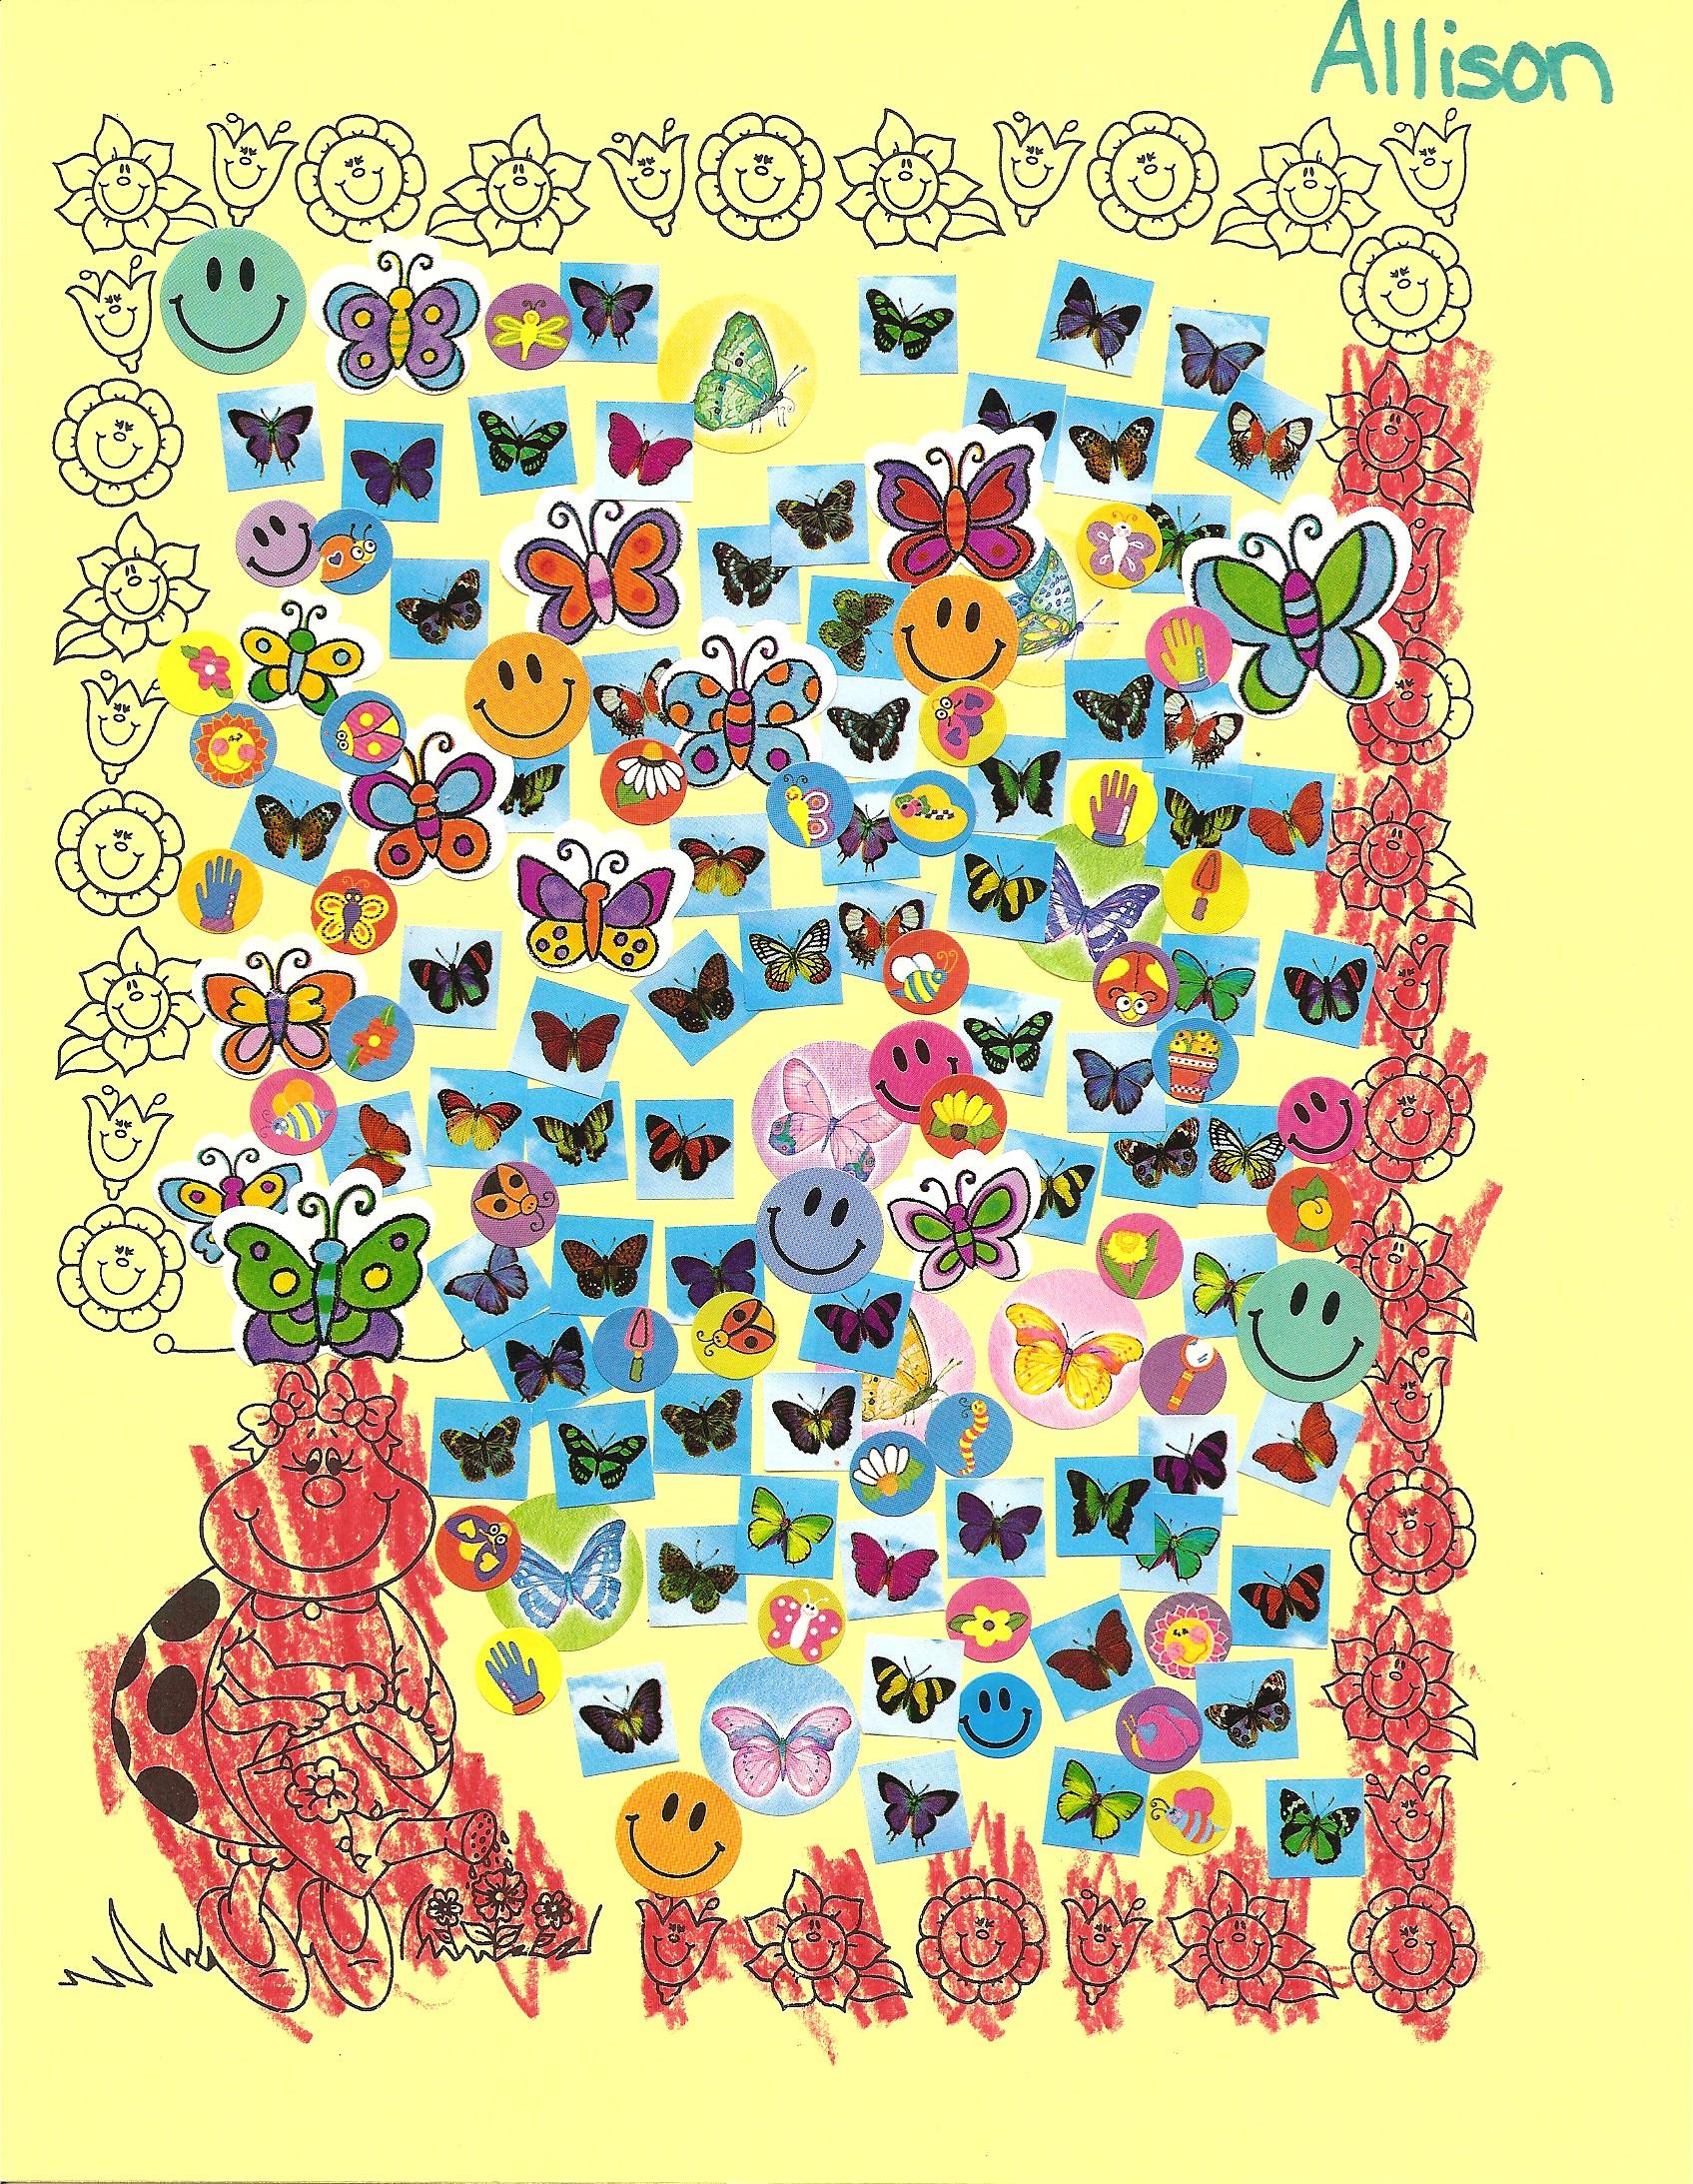 2009-04-20-allison-butterflies.jpg